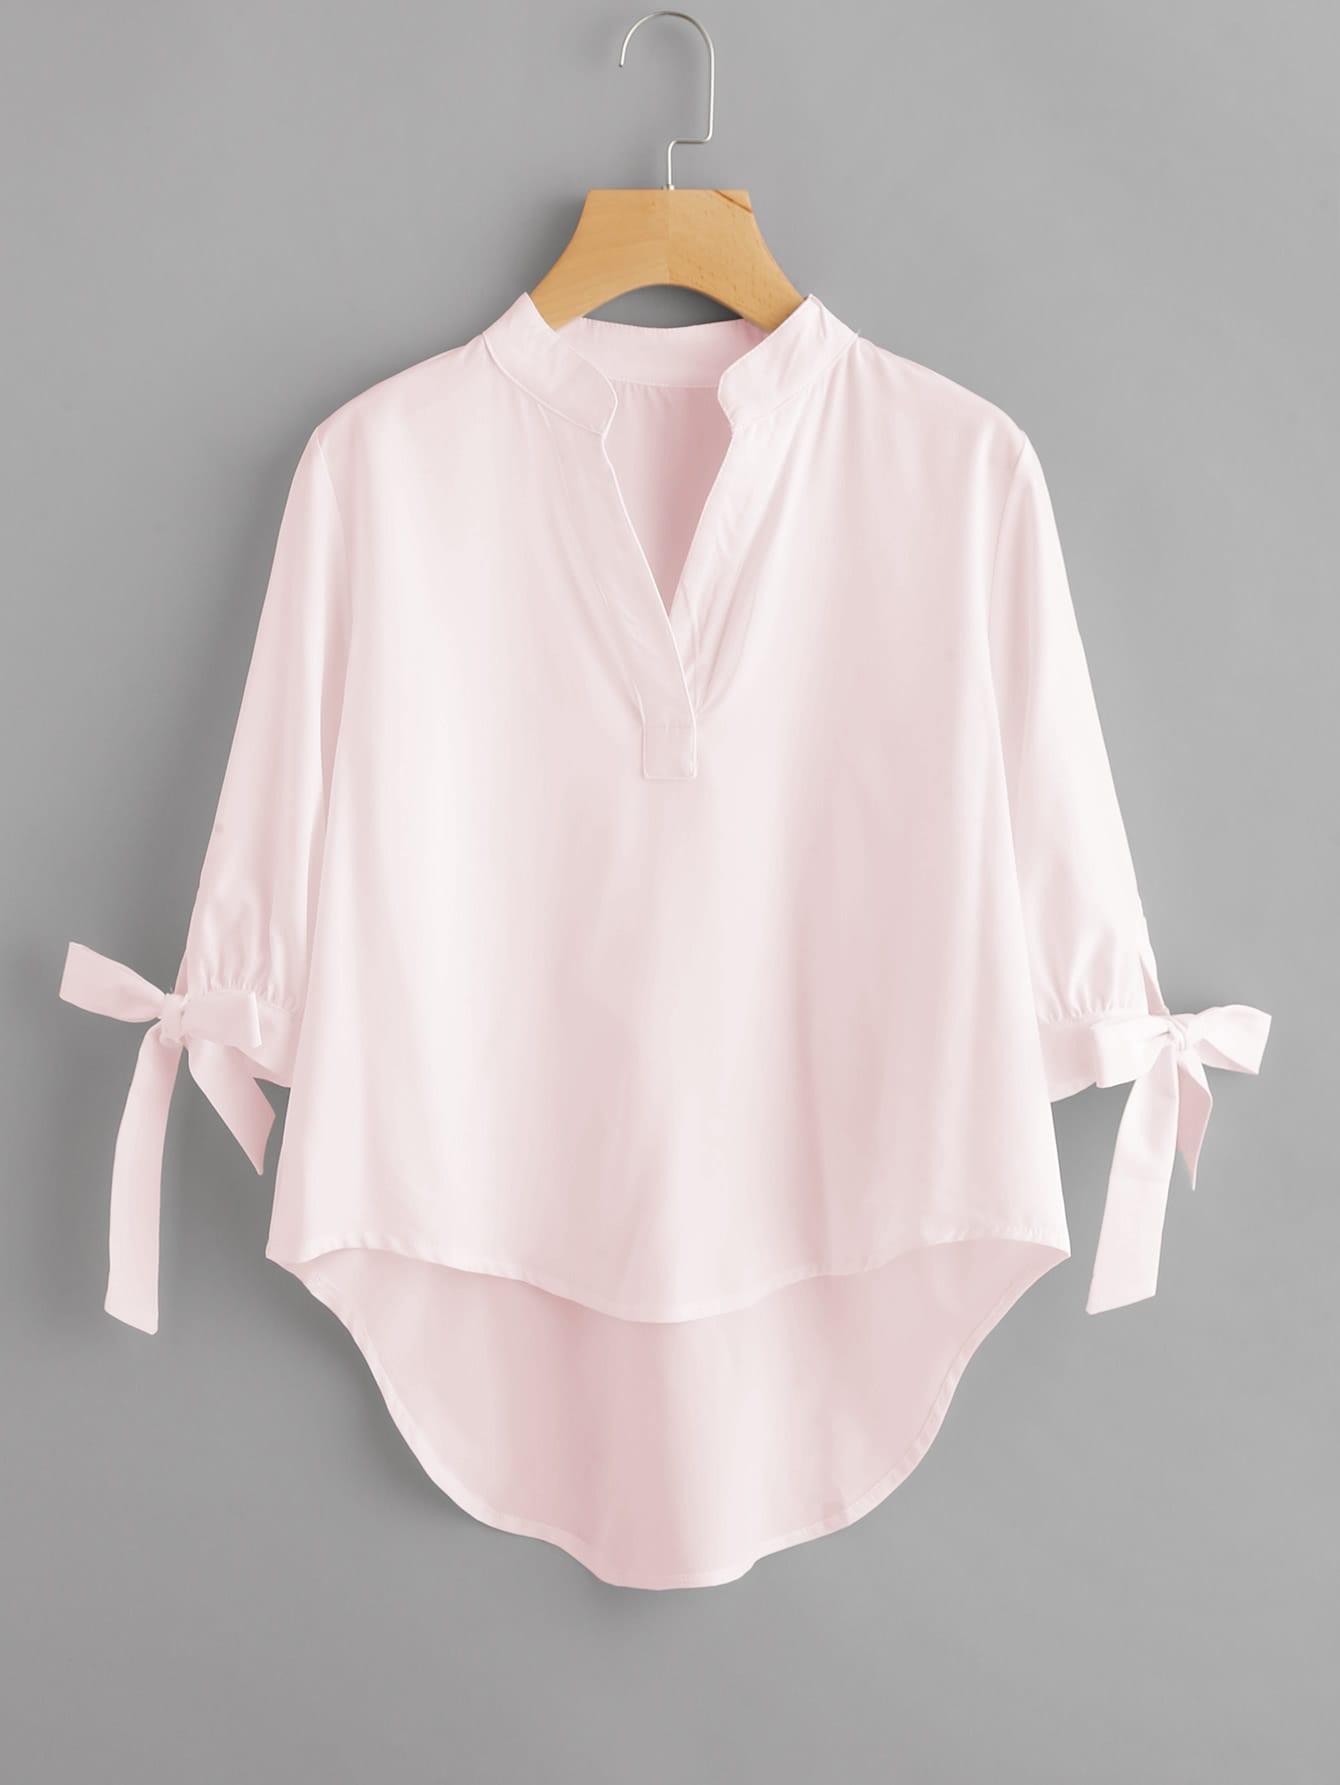 Tie Cuff Dip Hem Blouse tie cuff button front blouse